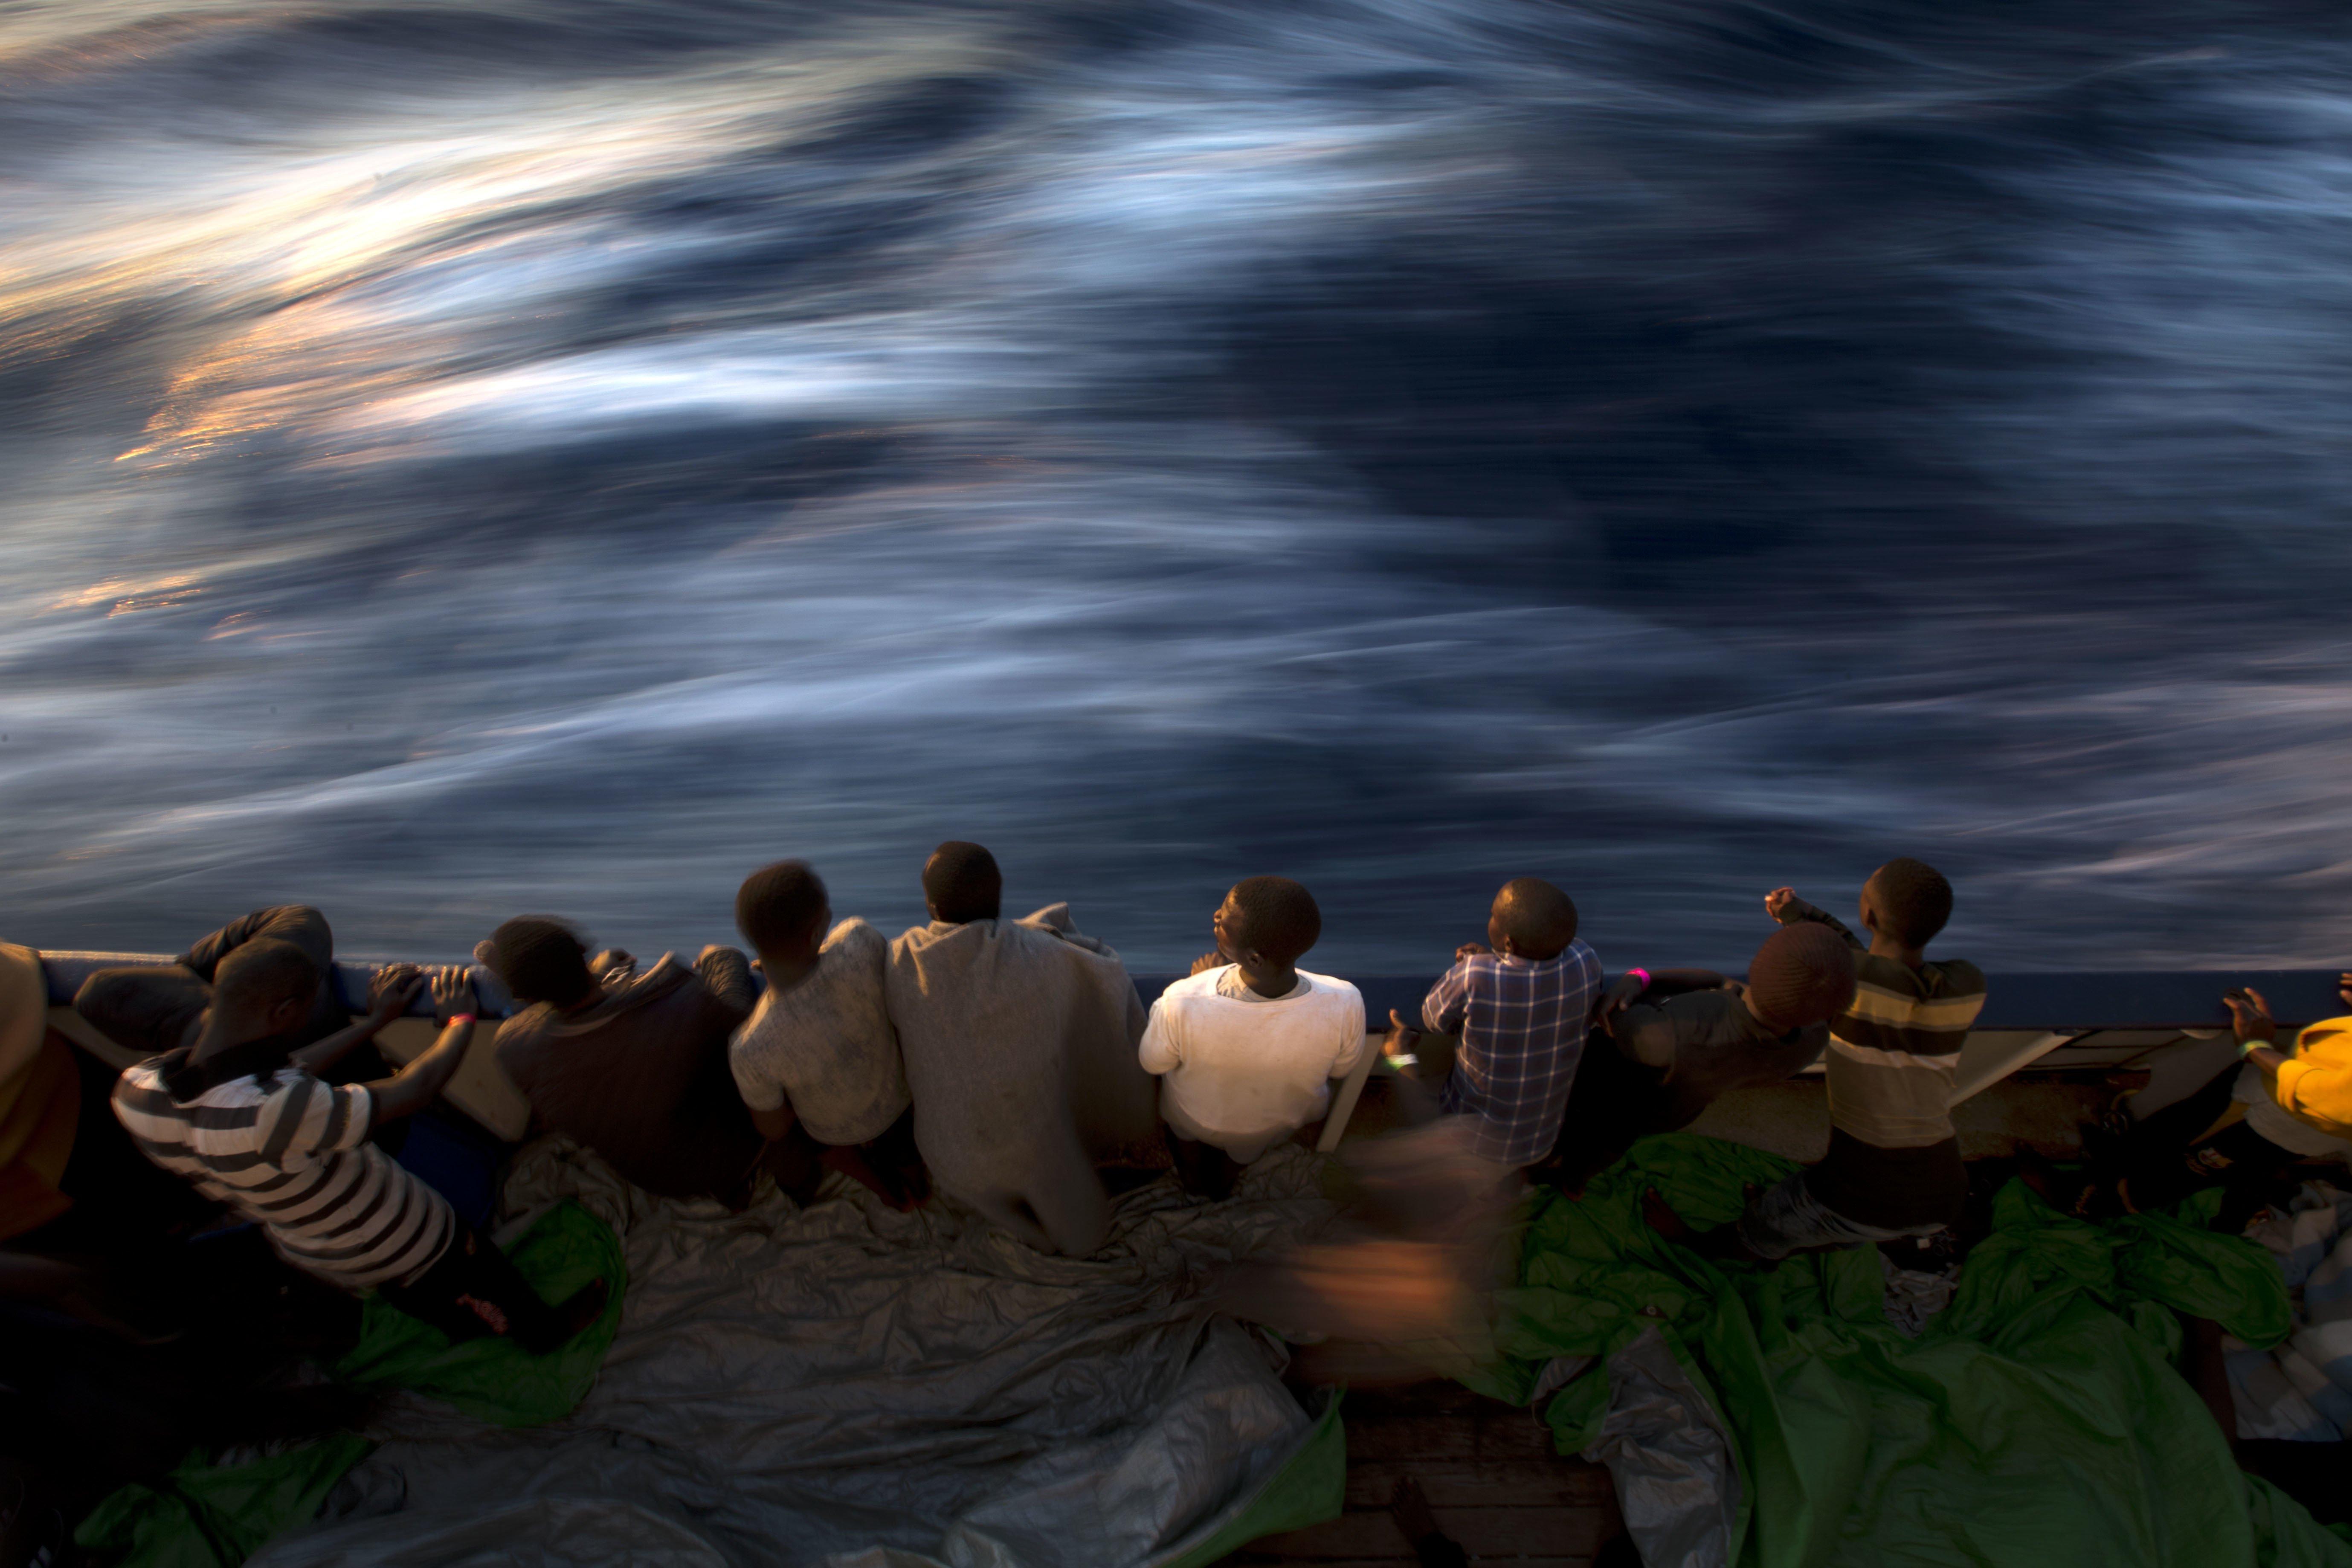 france-macron-refugees-libya-boat.jpg